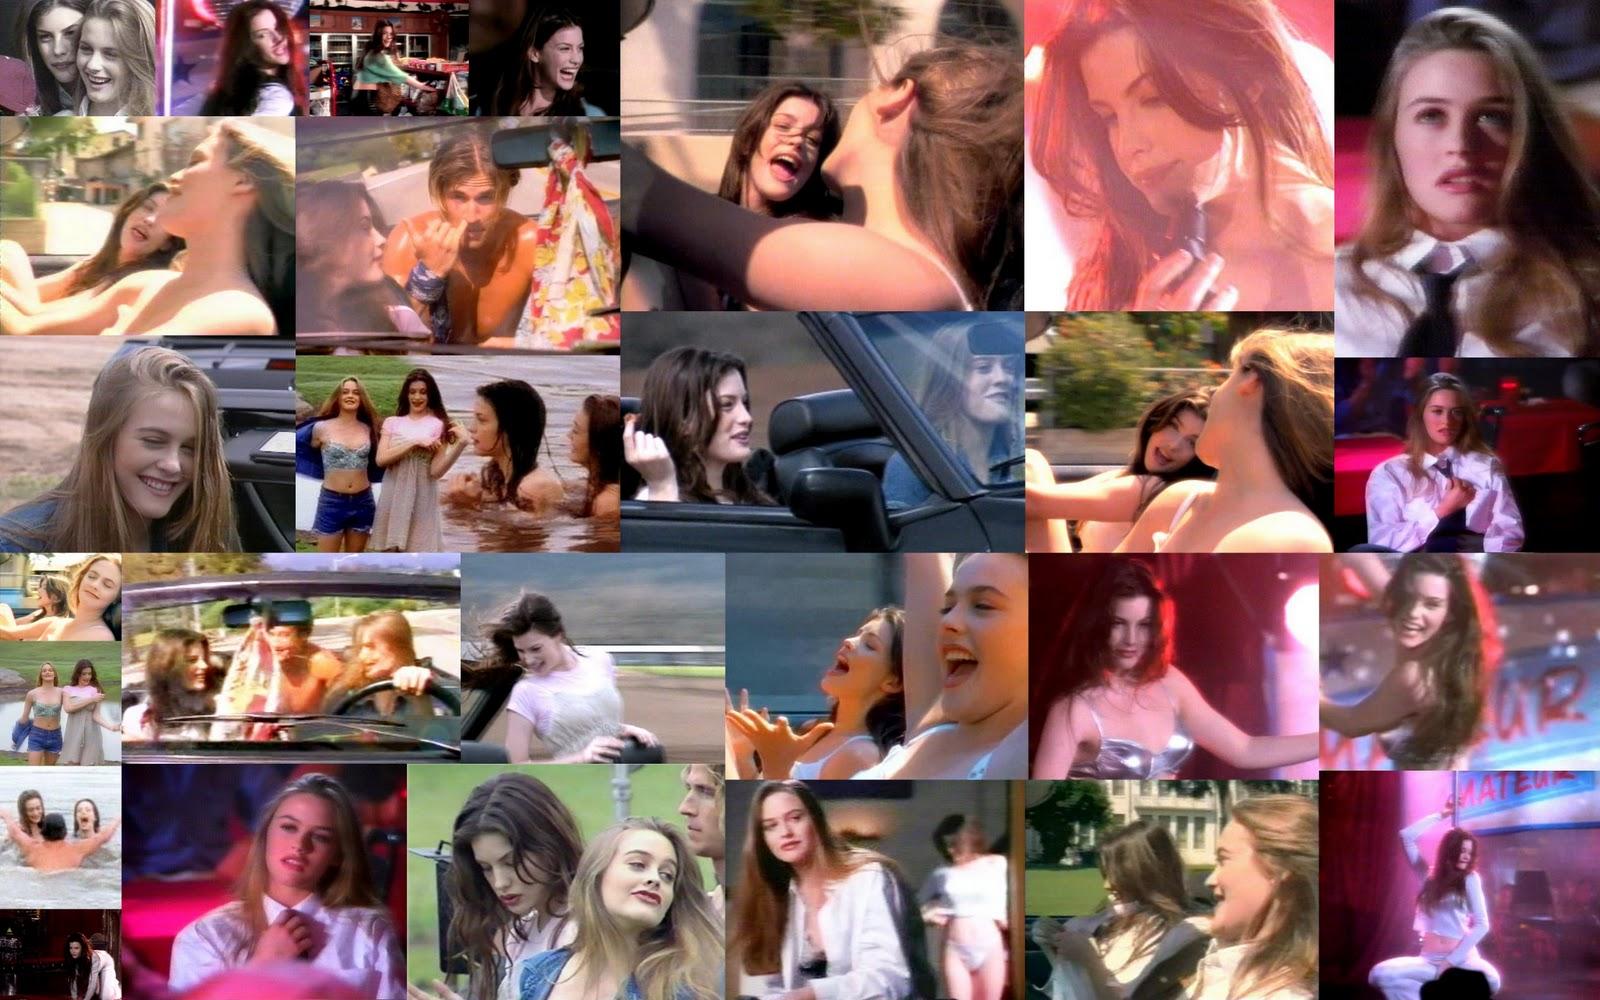 http://2.bp.blogspot.com/_VBWYS49PYAY/TS5dFT9zvvI/AAAAAAAAAN0/F1MJSxn-D6o/s1600/Crazy+Aersomith+Alicia+Silverstone+and+Liv+Tyler.jpg